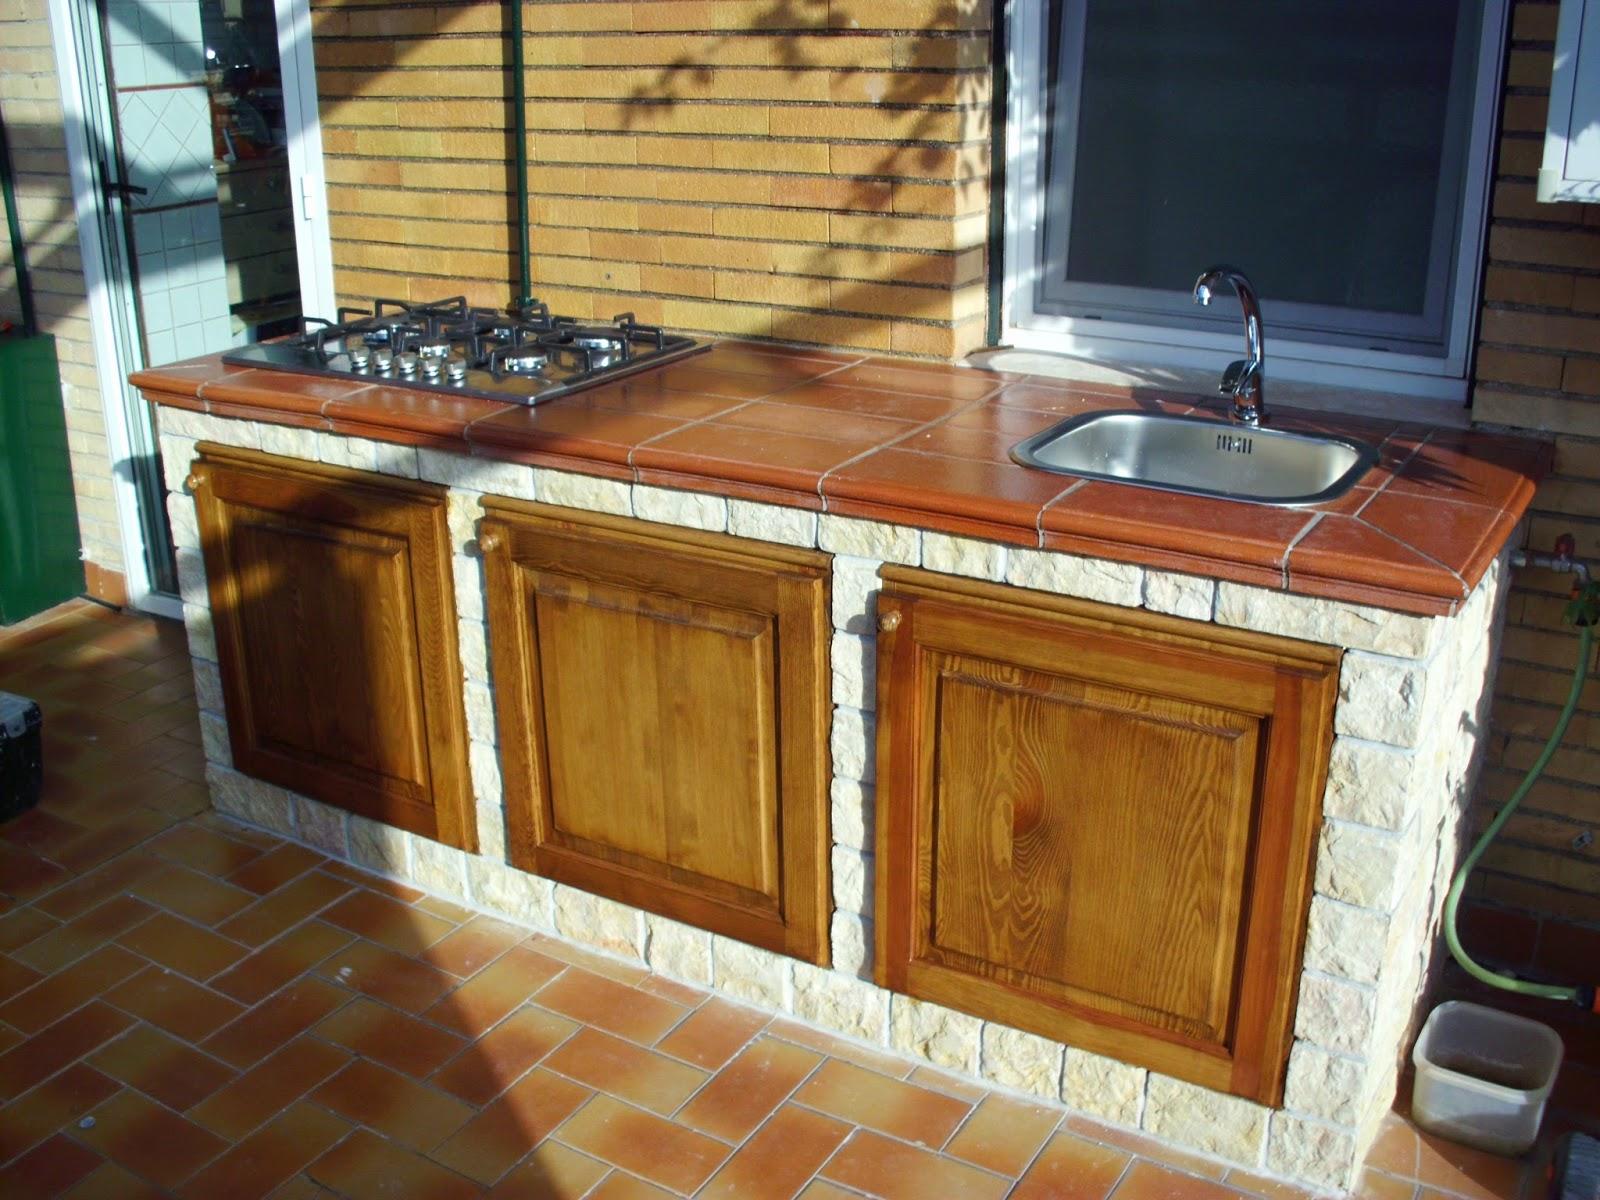 Creazione di una cucina in muratura da esterno su di un balcone ...